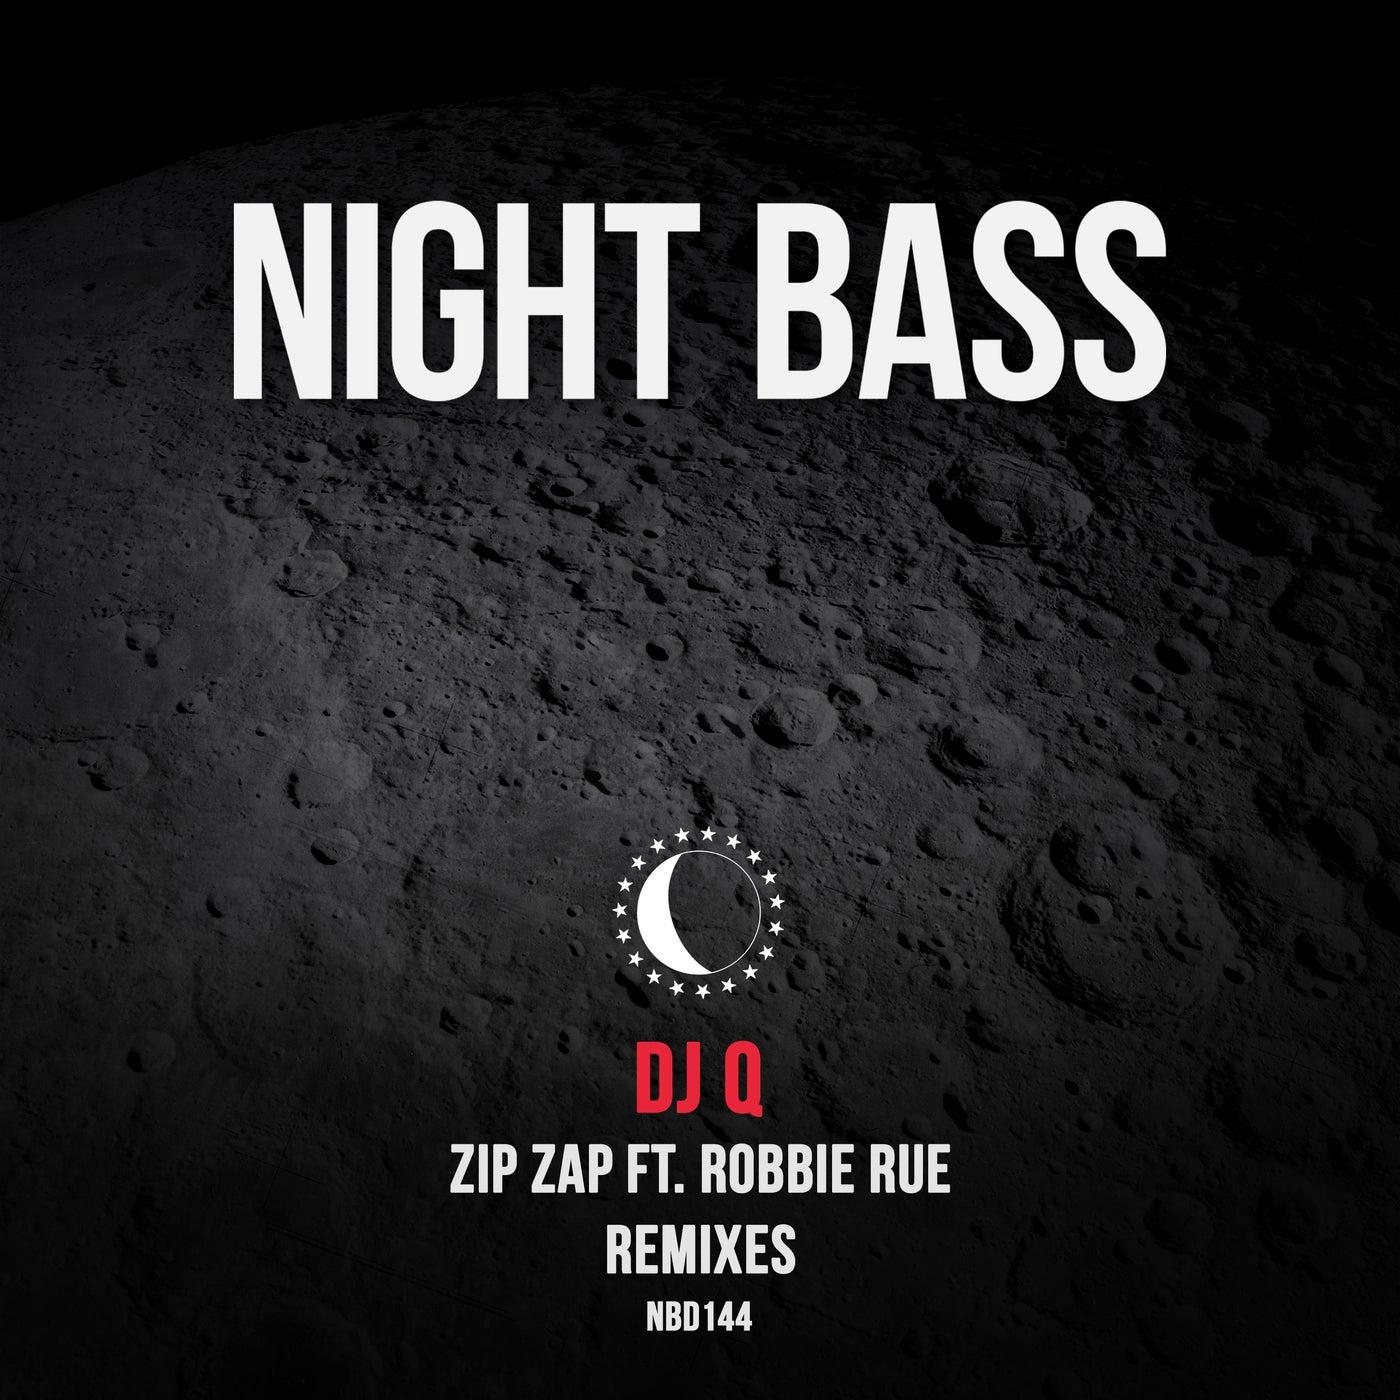 Zip Zap (AC Slater Remix)